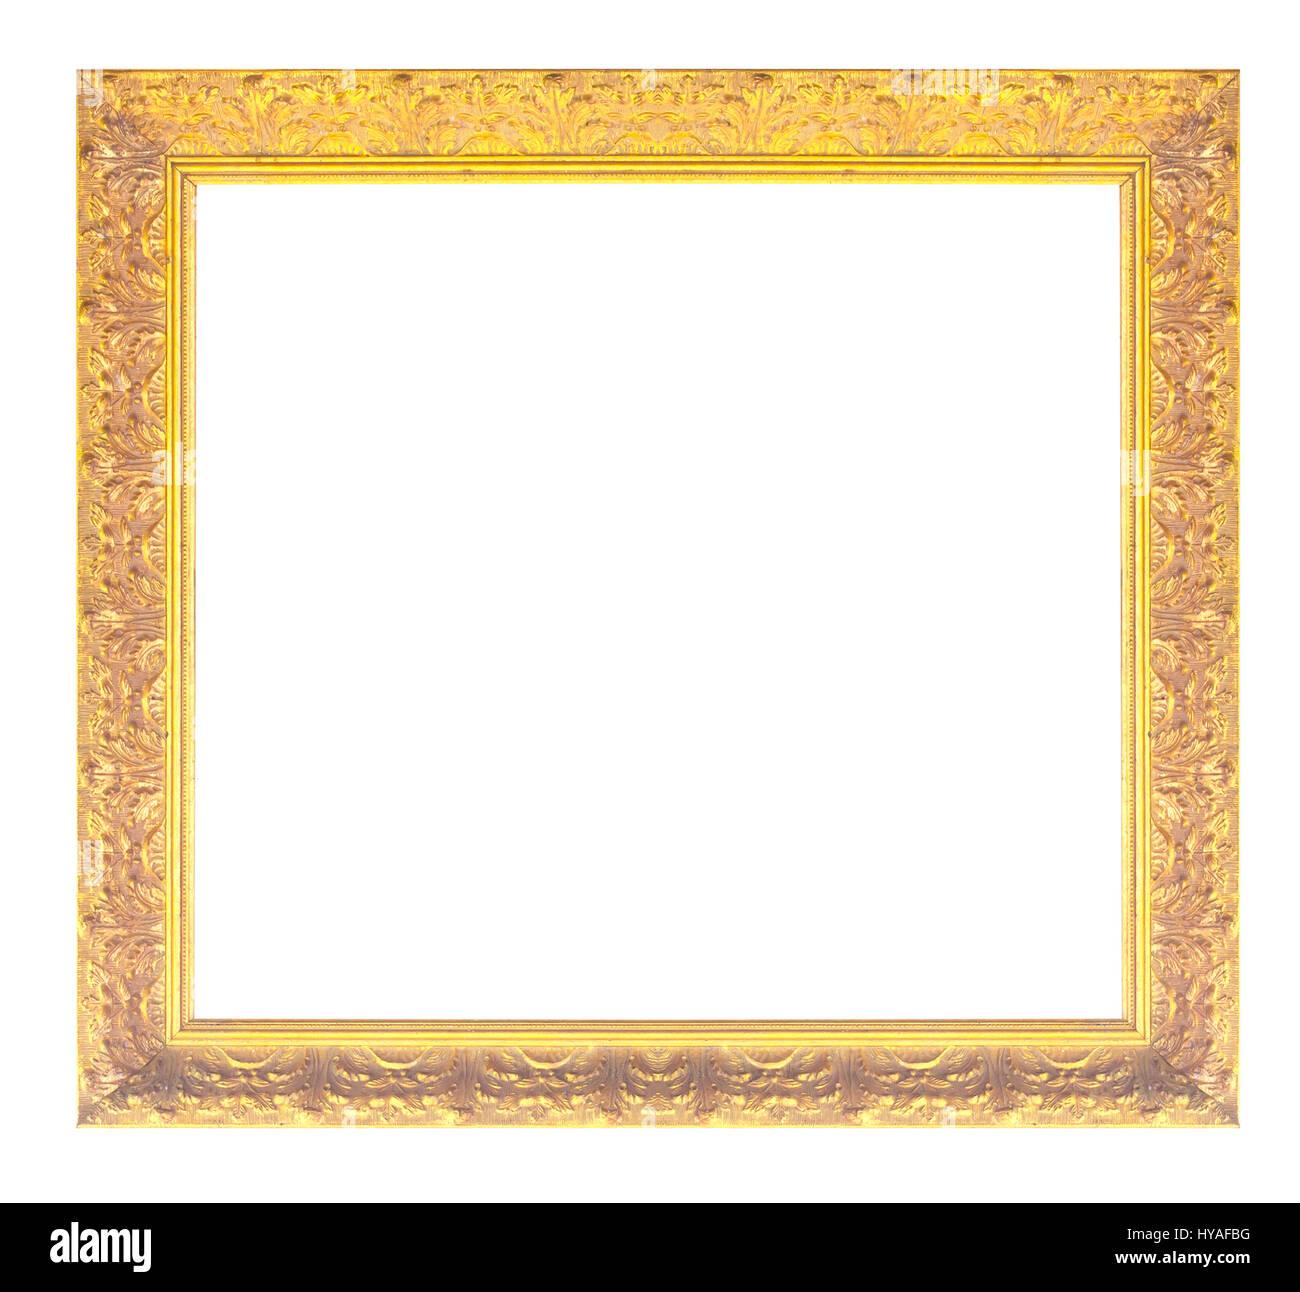 Gold Photo Frame Stockfotos & Gold Photo Frame Bilder - Alamy